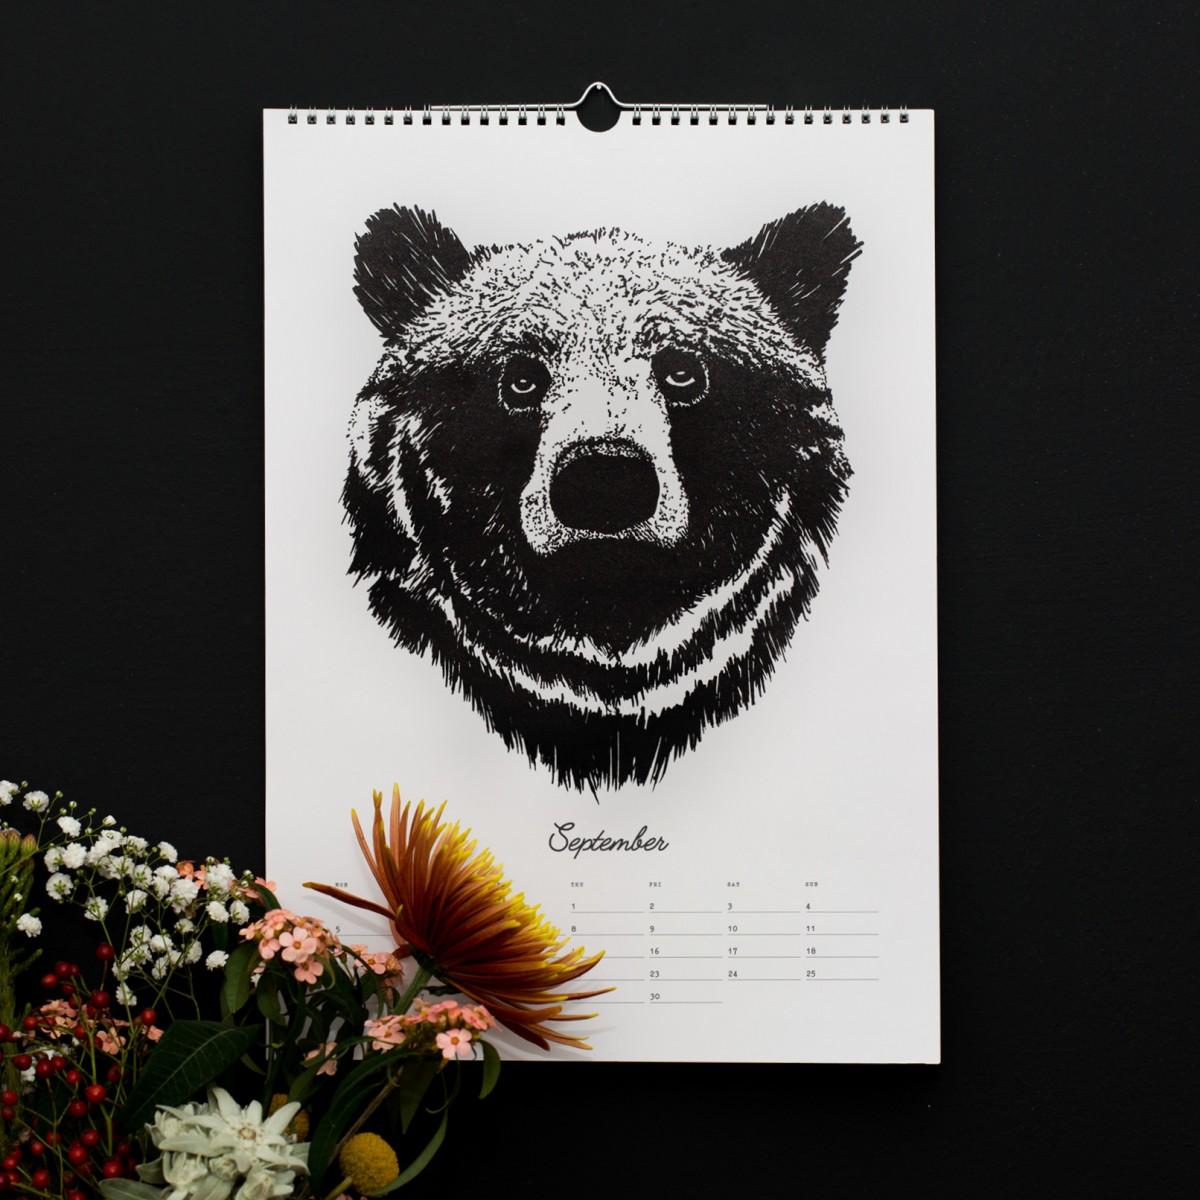 Wandkalender / Geburtstagskalender / Kalender 2022